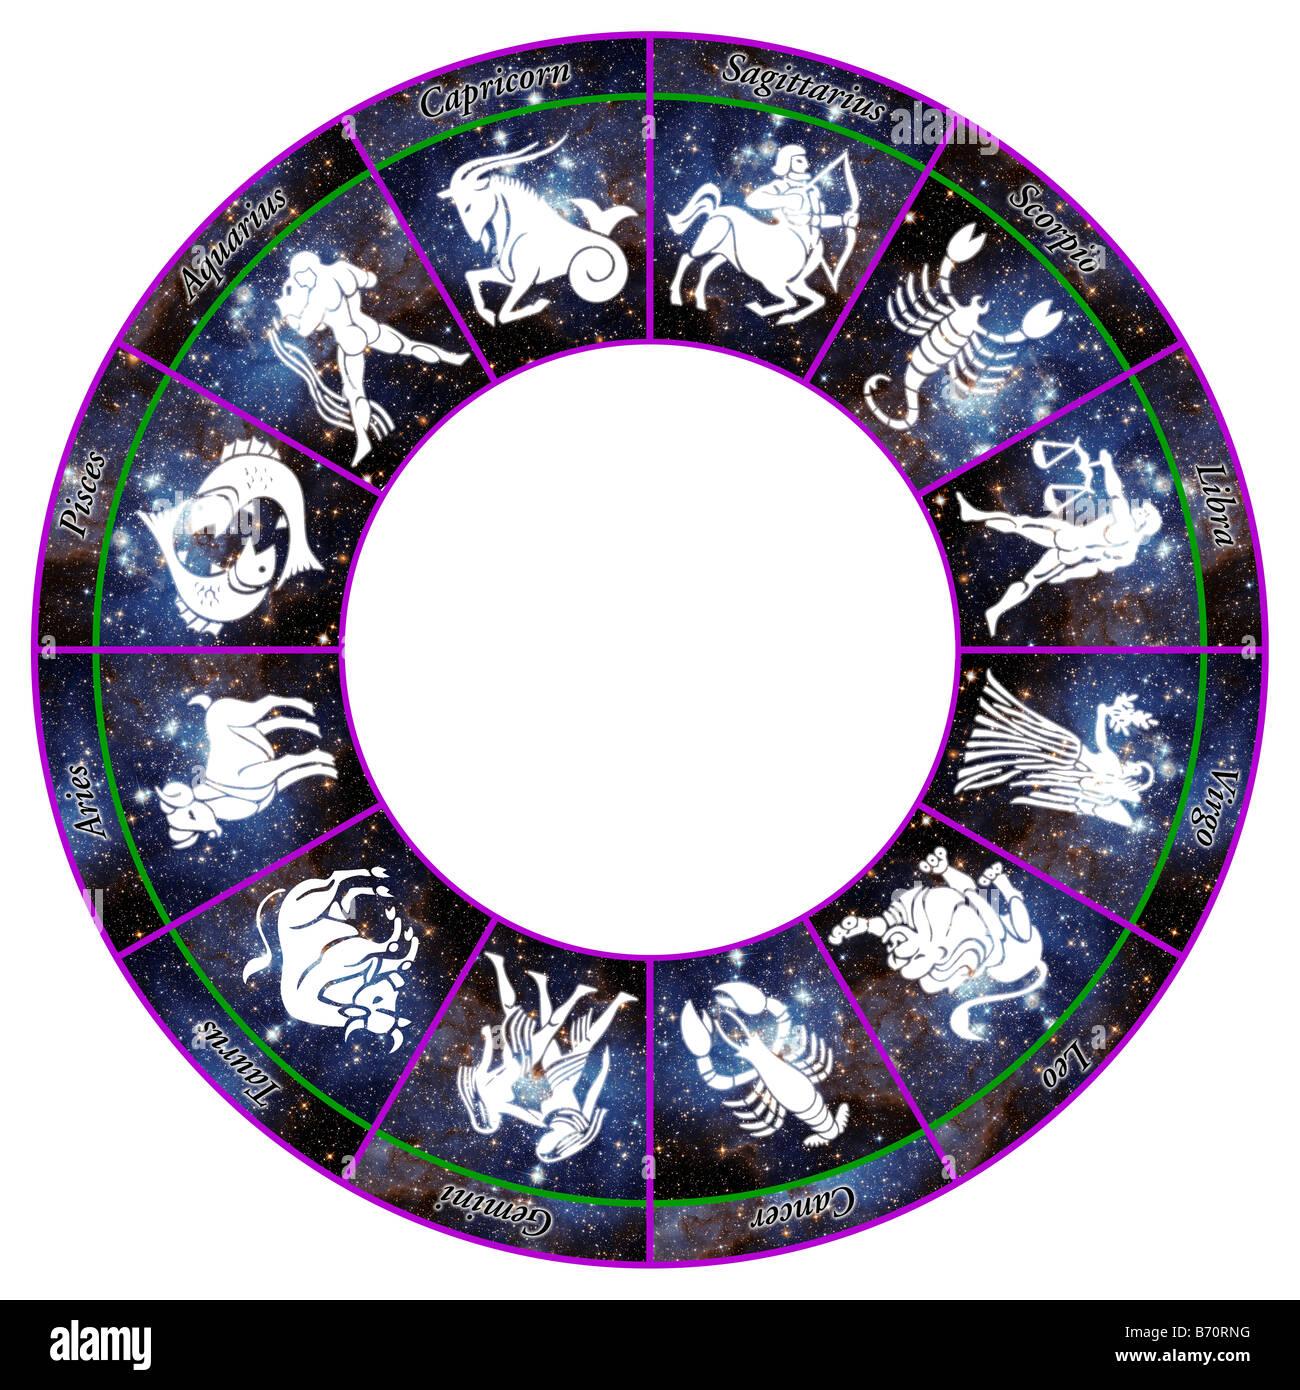 Zodiac Horoscope Birth Sign Wheel - Stock Image